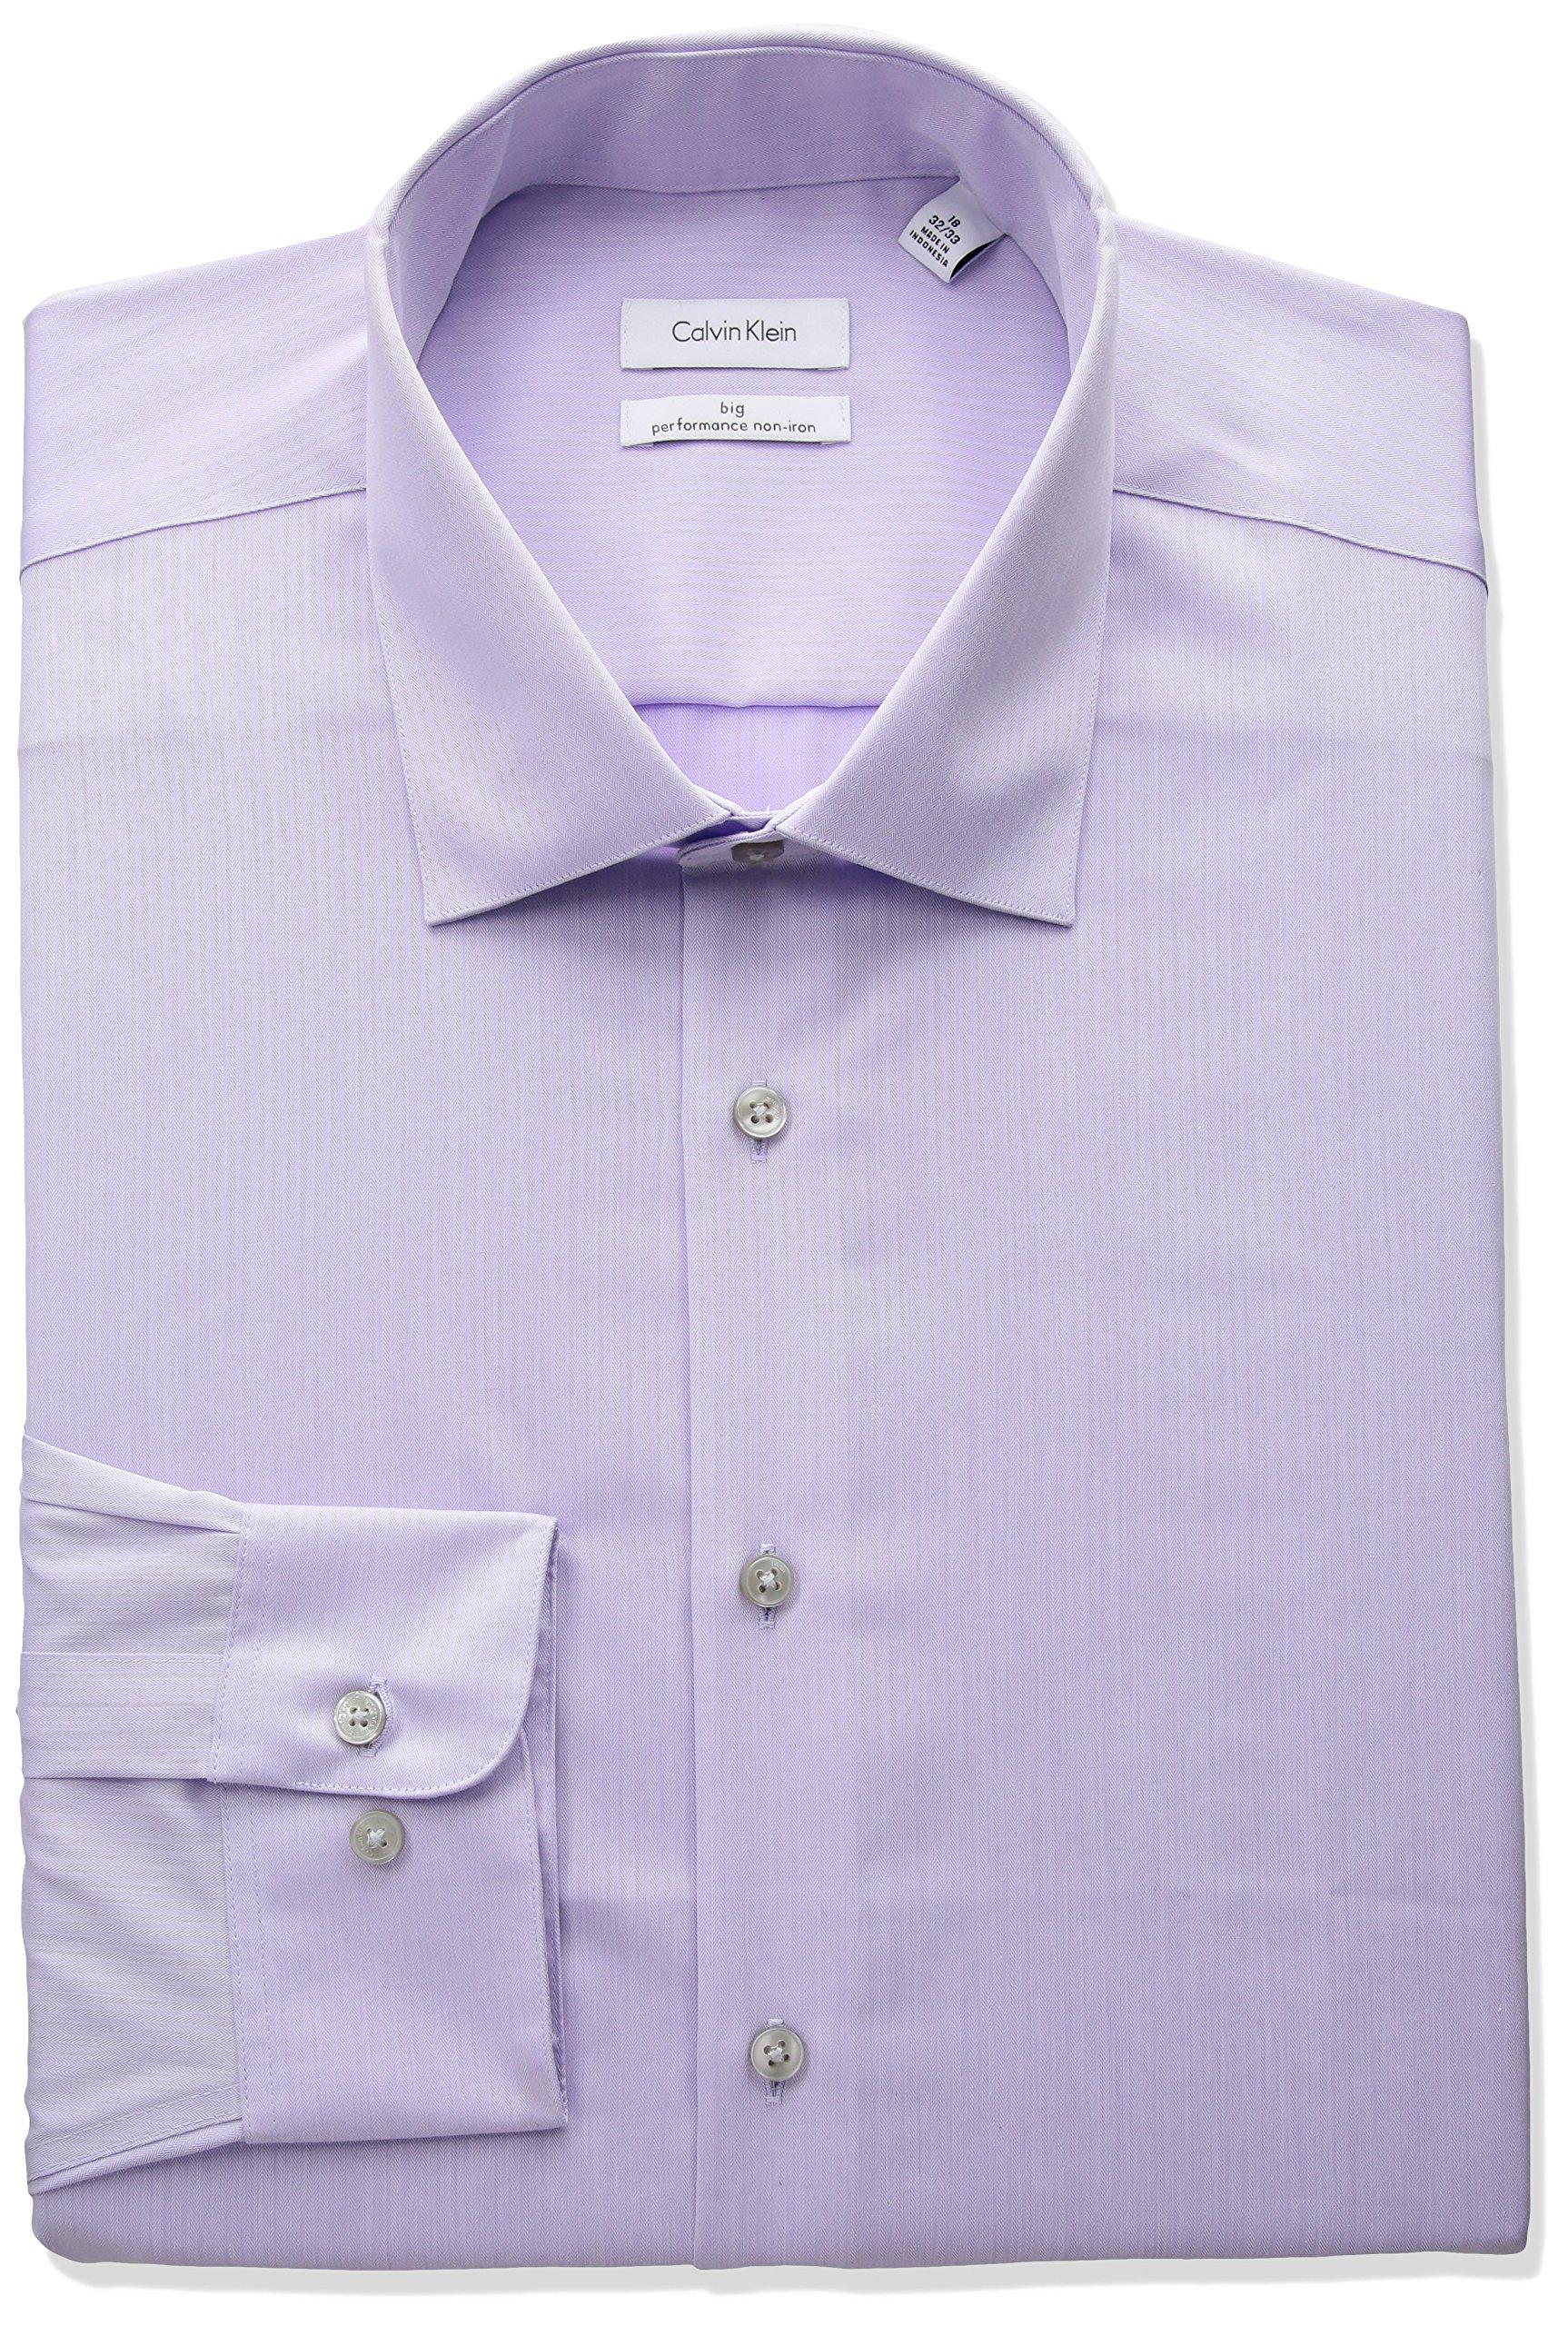 Calvin Klein Men's Big and Tall Non Iron Fit Herringbone Spread Collar Dress Shirt, Lilac, 20'' Neck 34''-35'' Sleeve